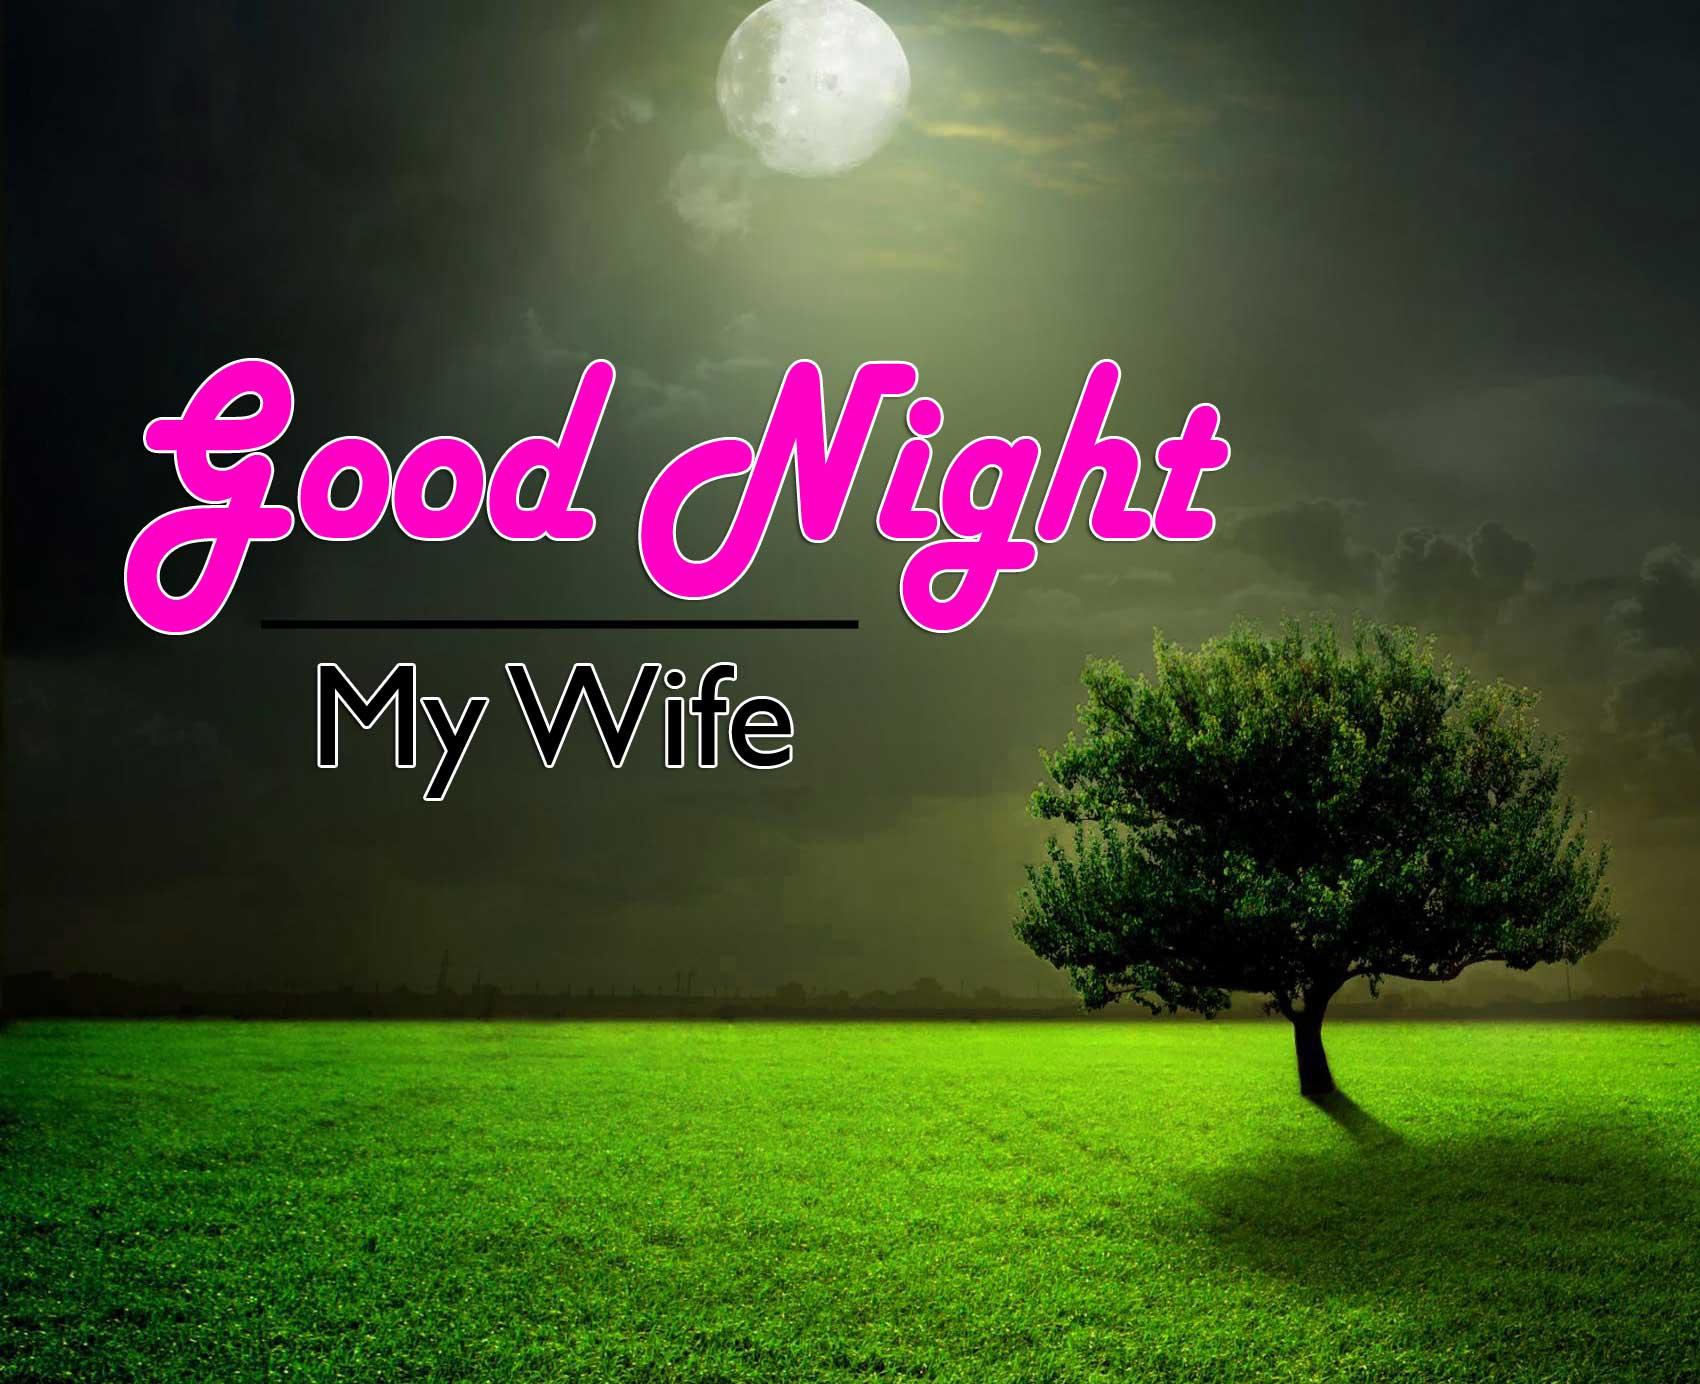 Free Full HD Good Night Pics Images